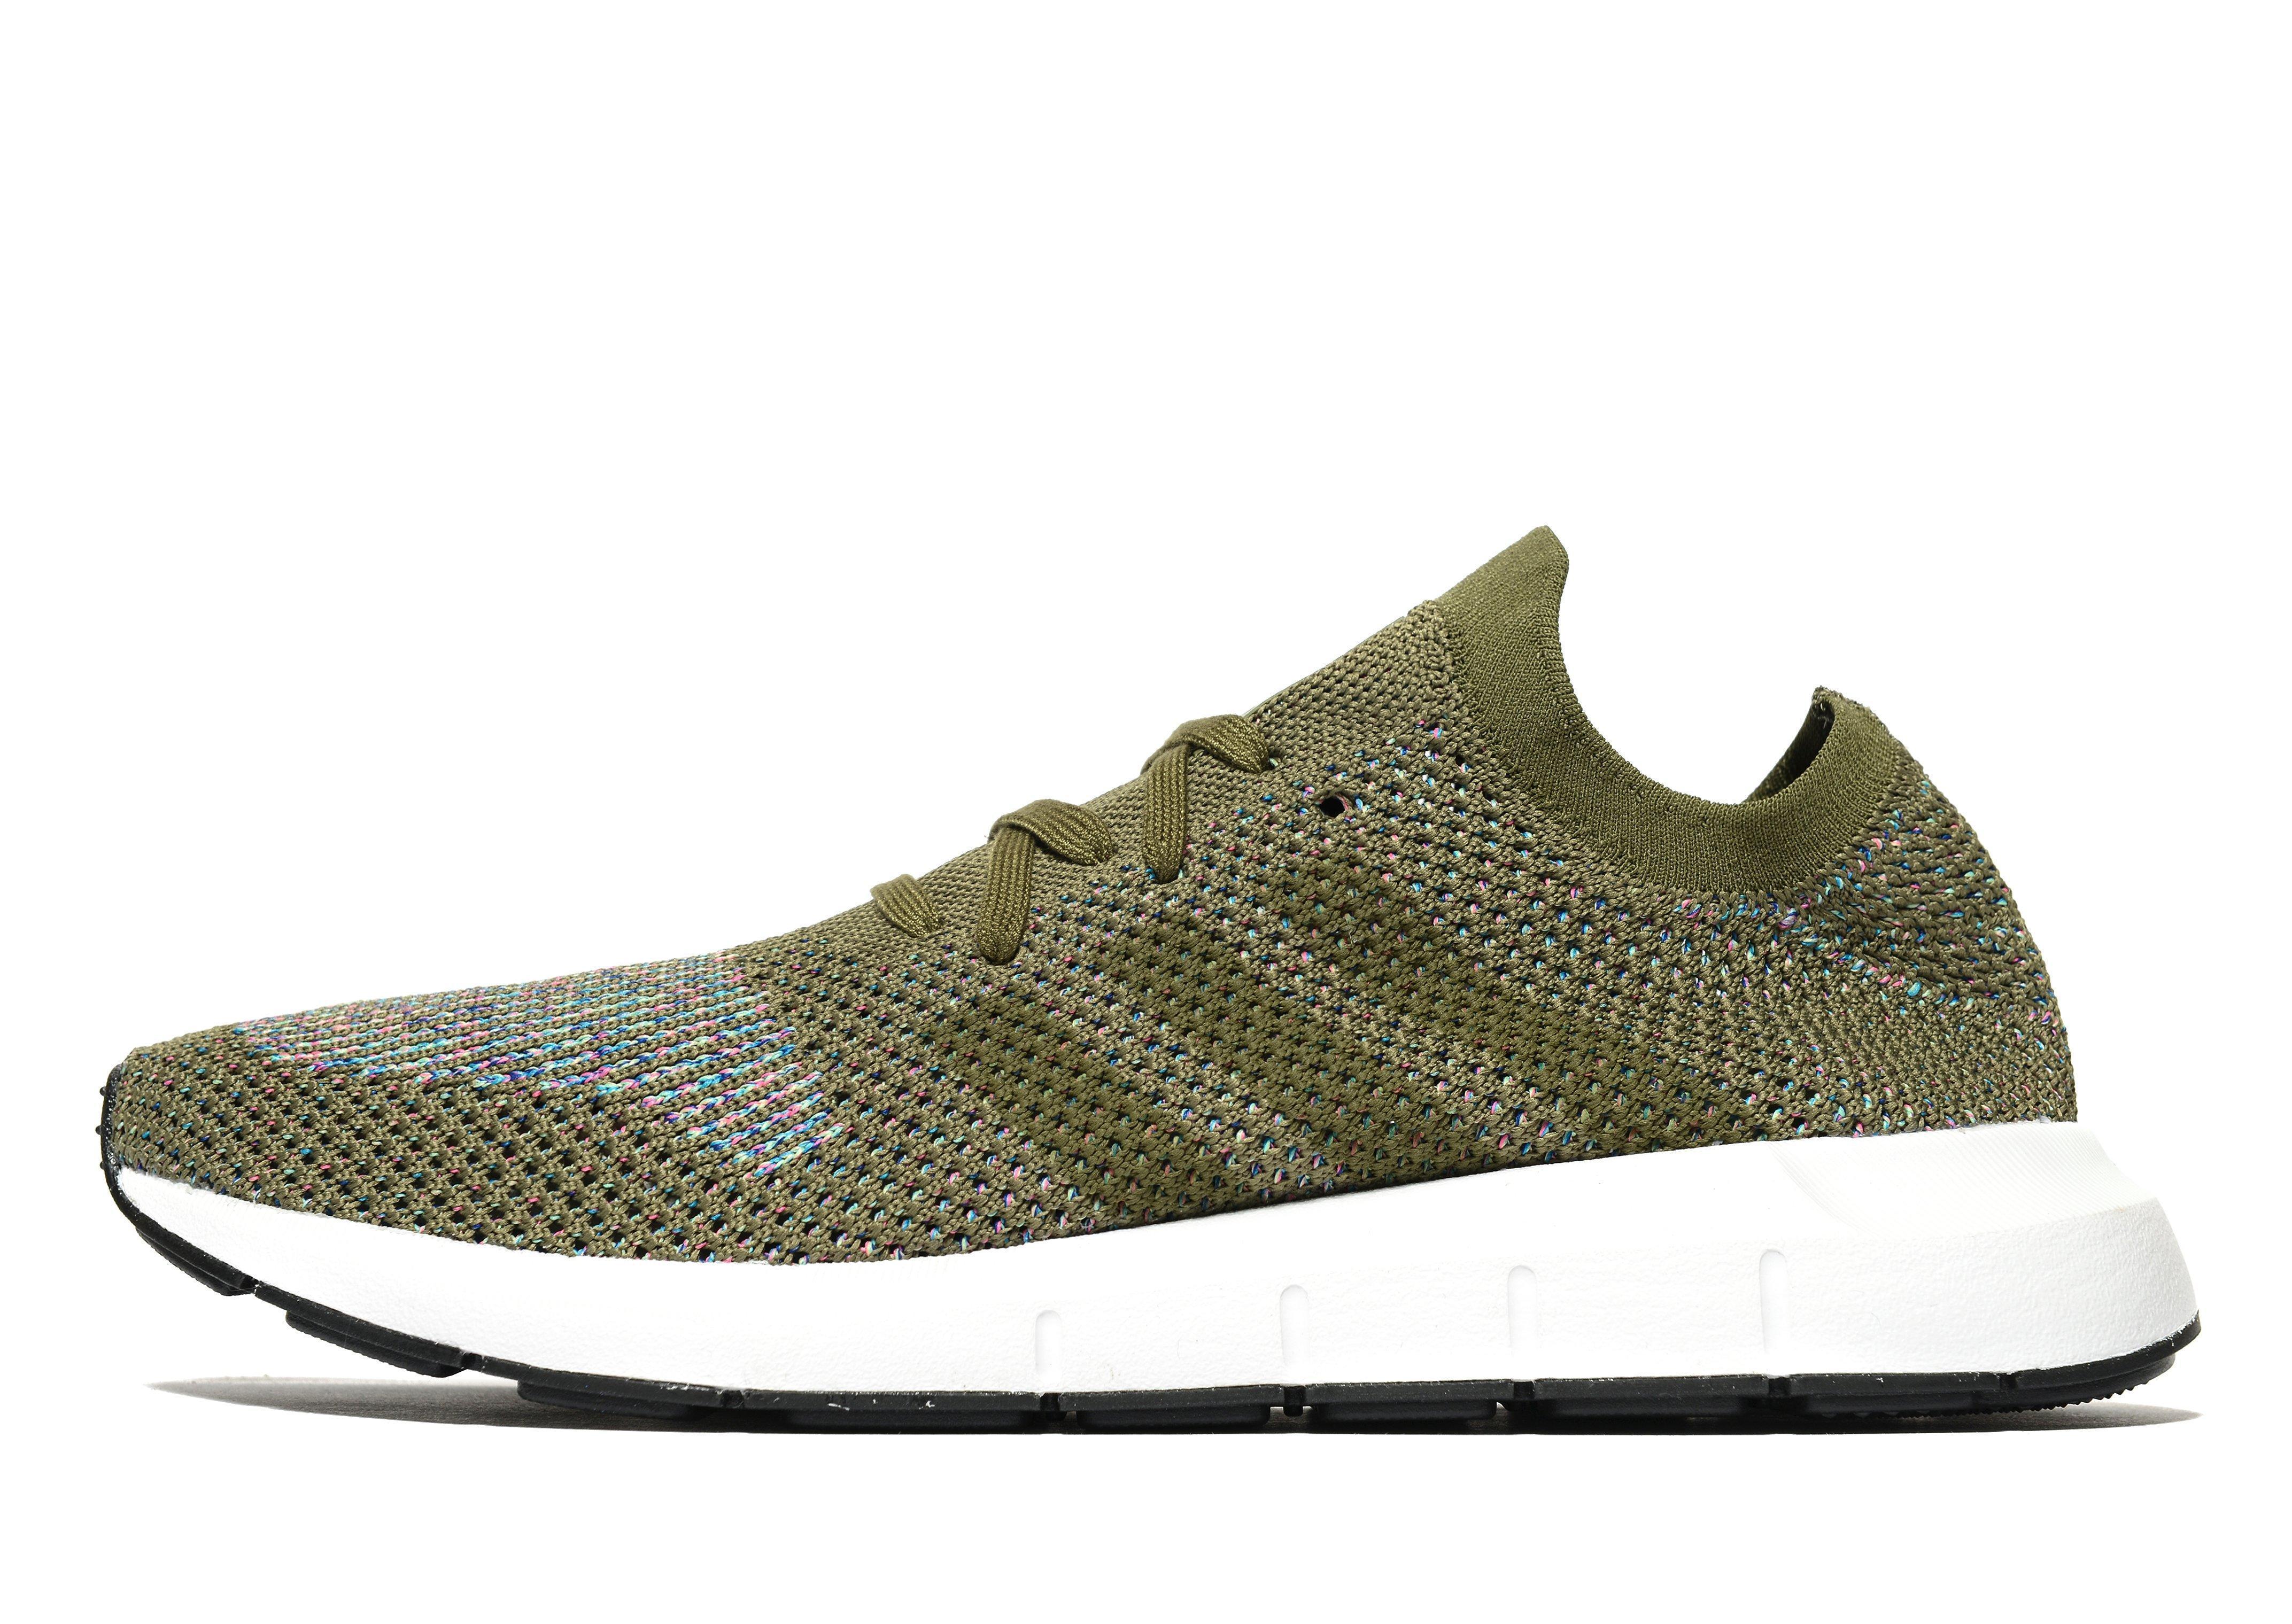 adidas swift run olive|61% OFF |danda